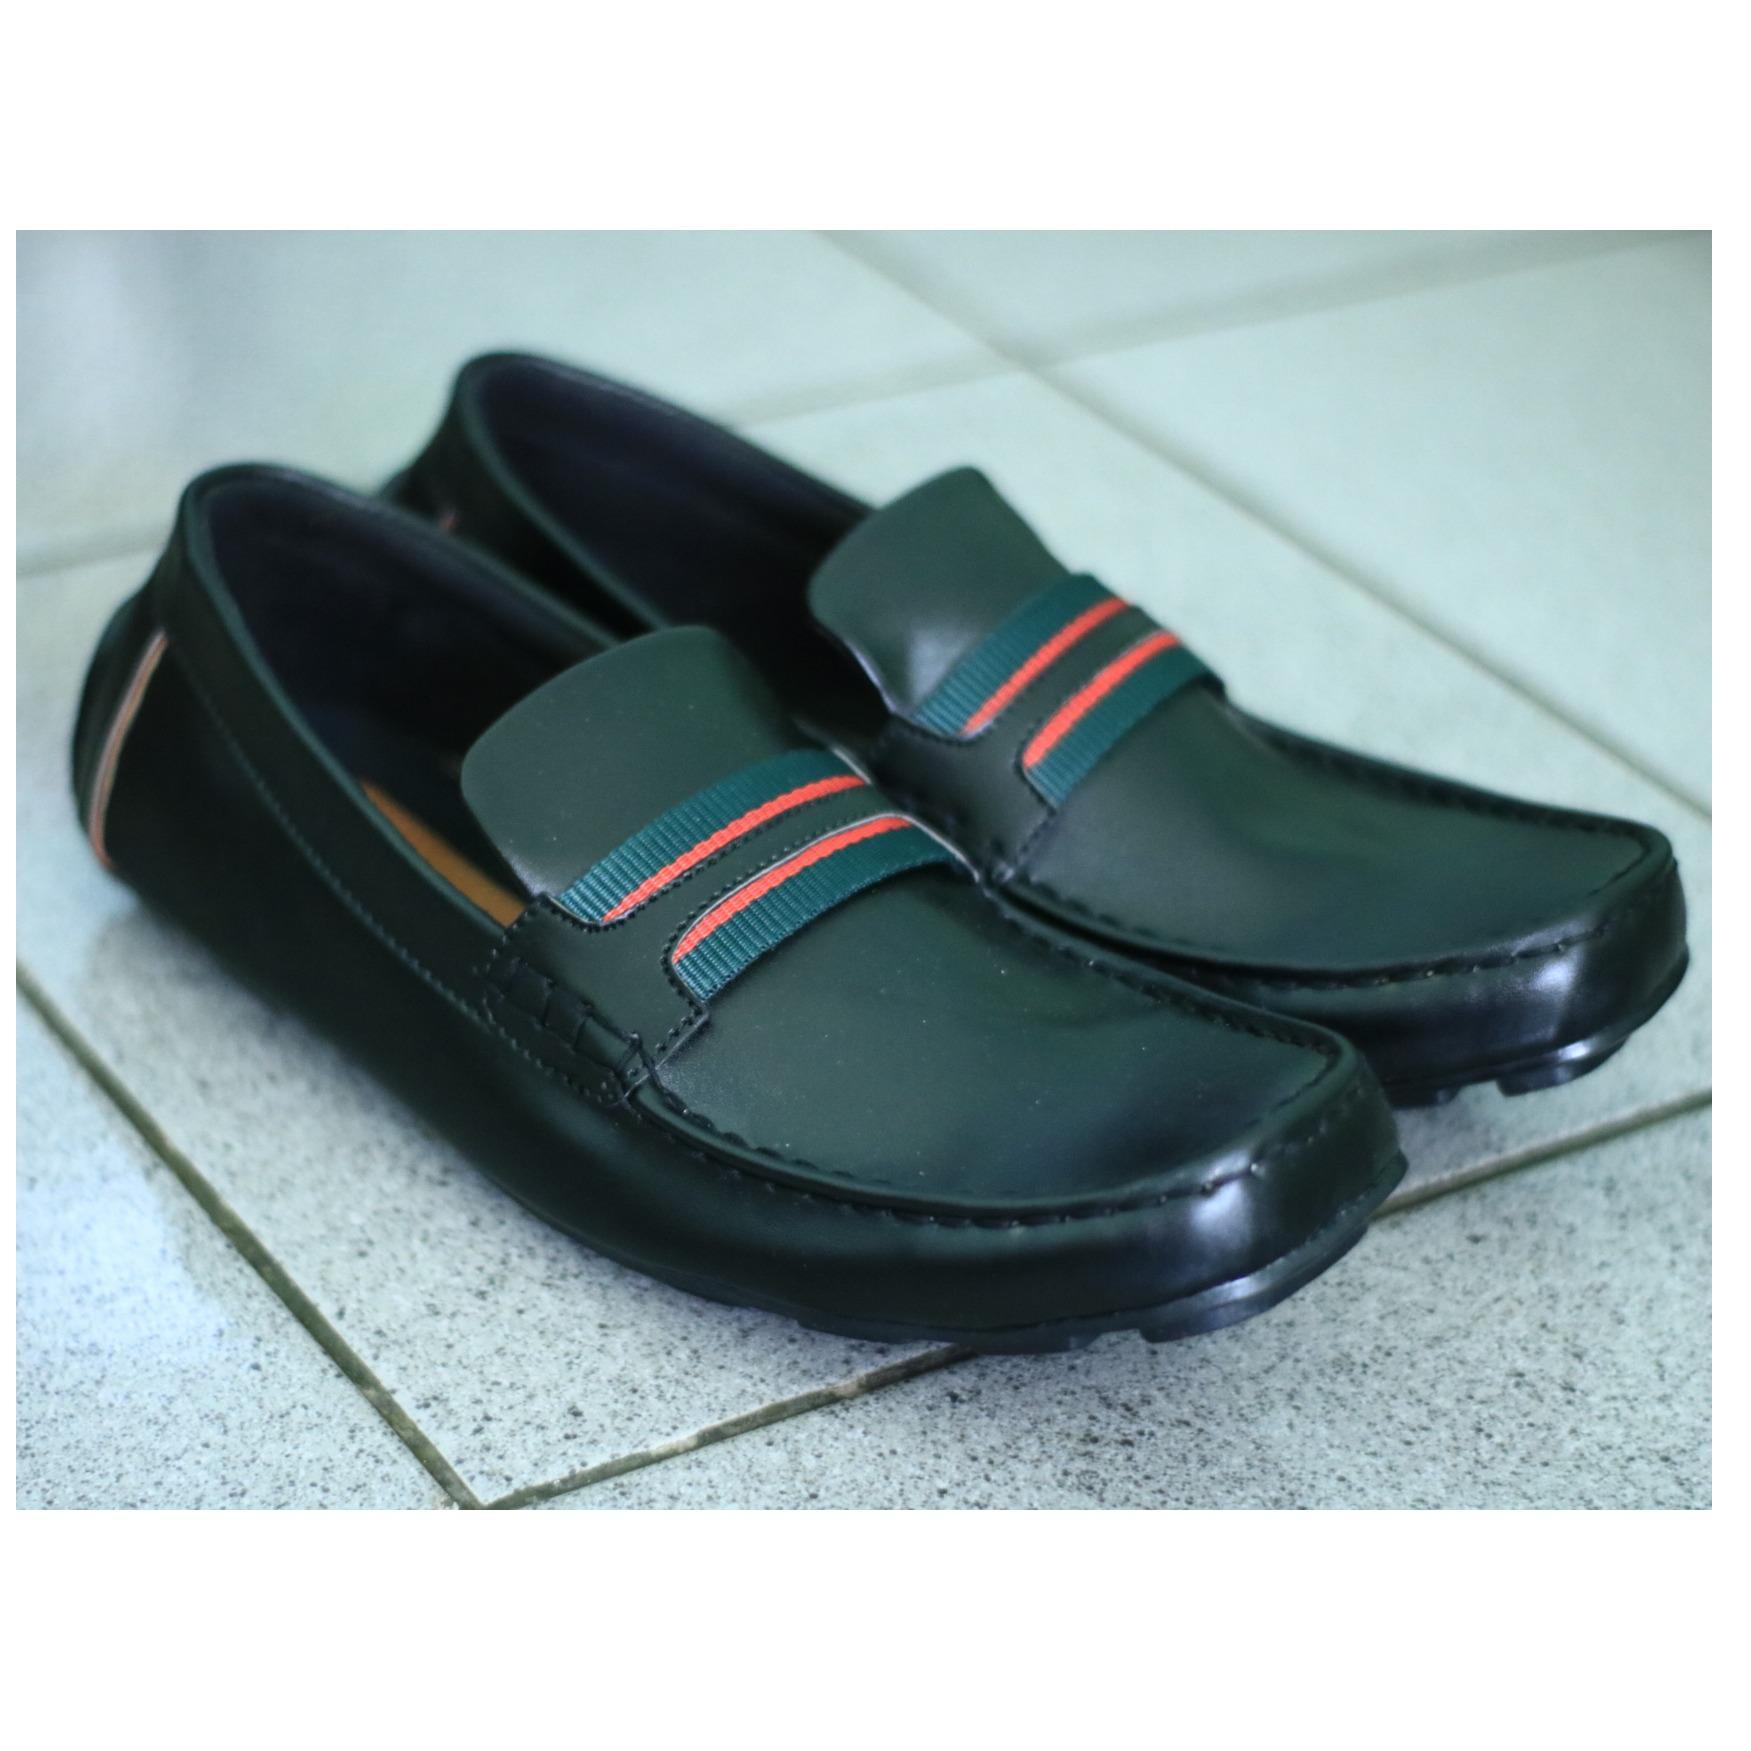 Sepatu kulit Slip-on (Guci) GUCCI Pria dan Kasual Pria - Multi Polos (Lokal)